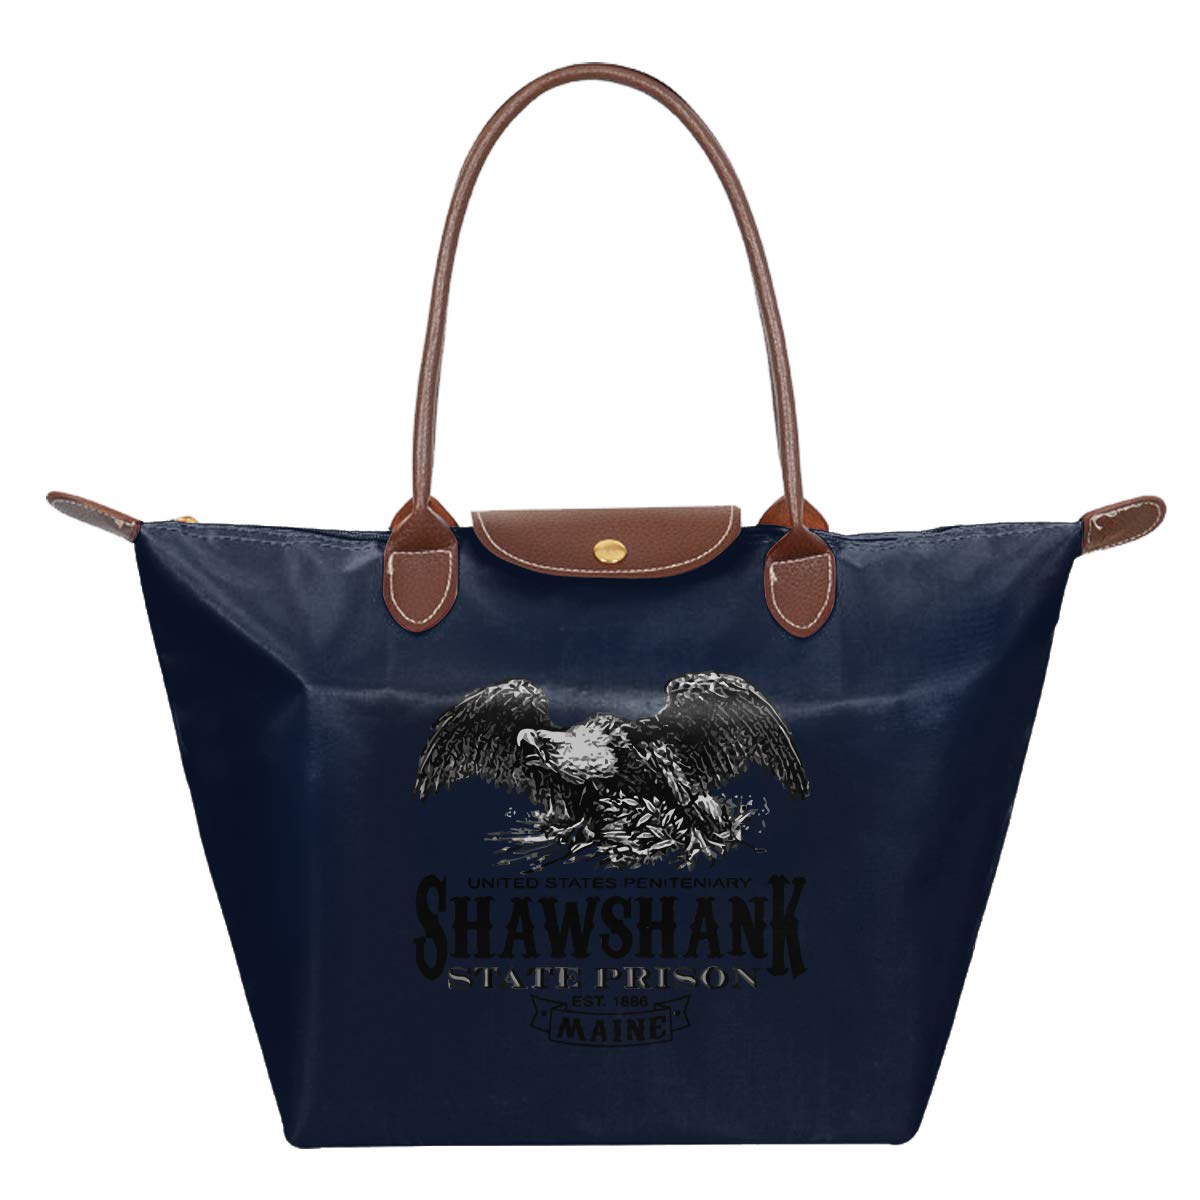 Shawshank Prison Novelty Jail Movie Waterproof Leather Folded Messenger Nylon Bag Travel Tote Hopping Folding School Handbags